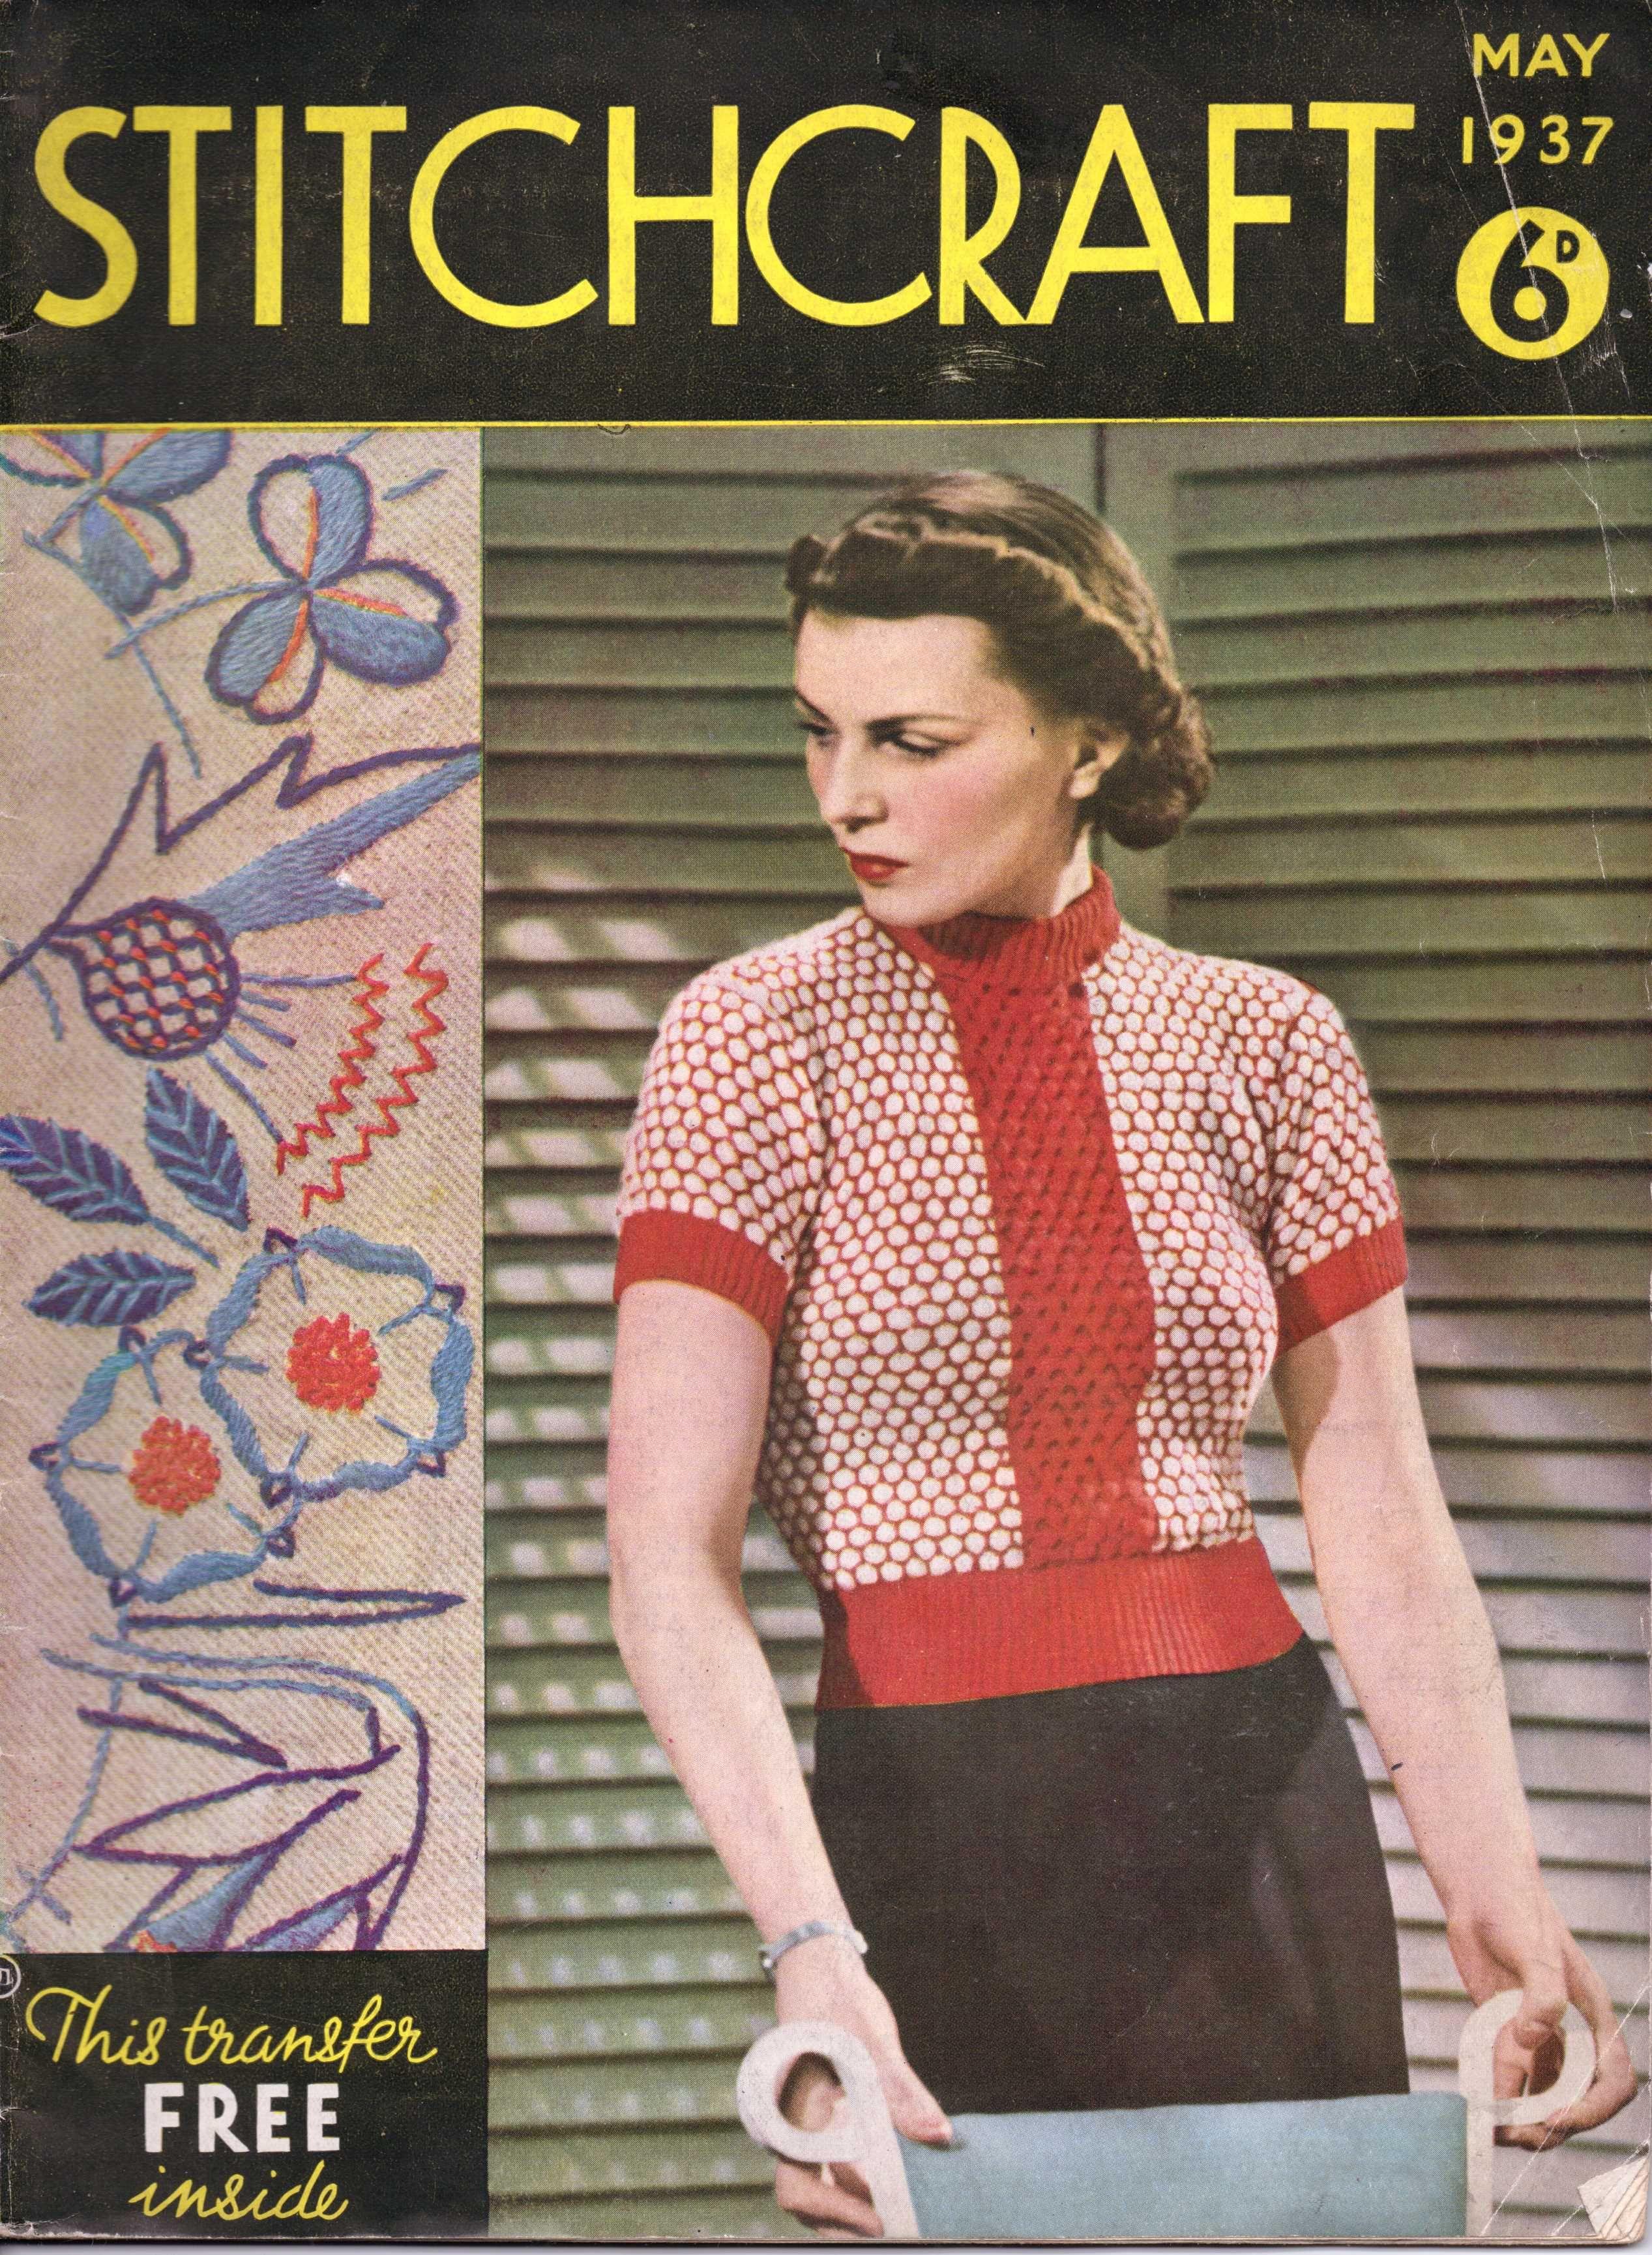 Stitchcraft May 1937 free vintage knitting pattern | knitting is my ...